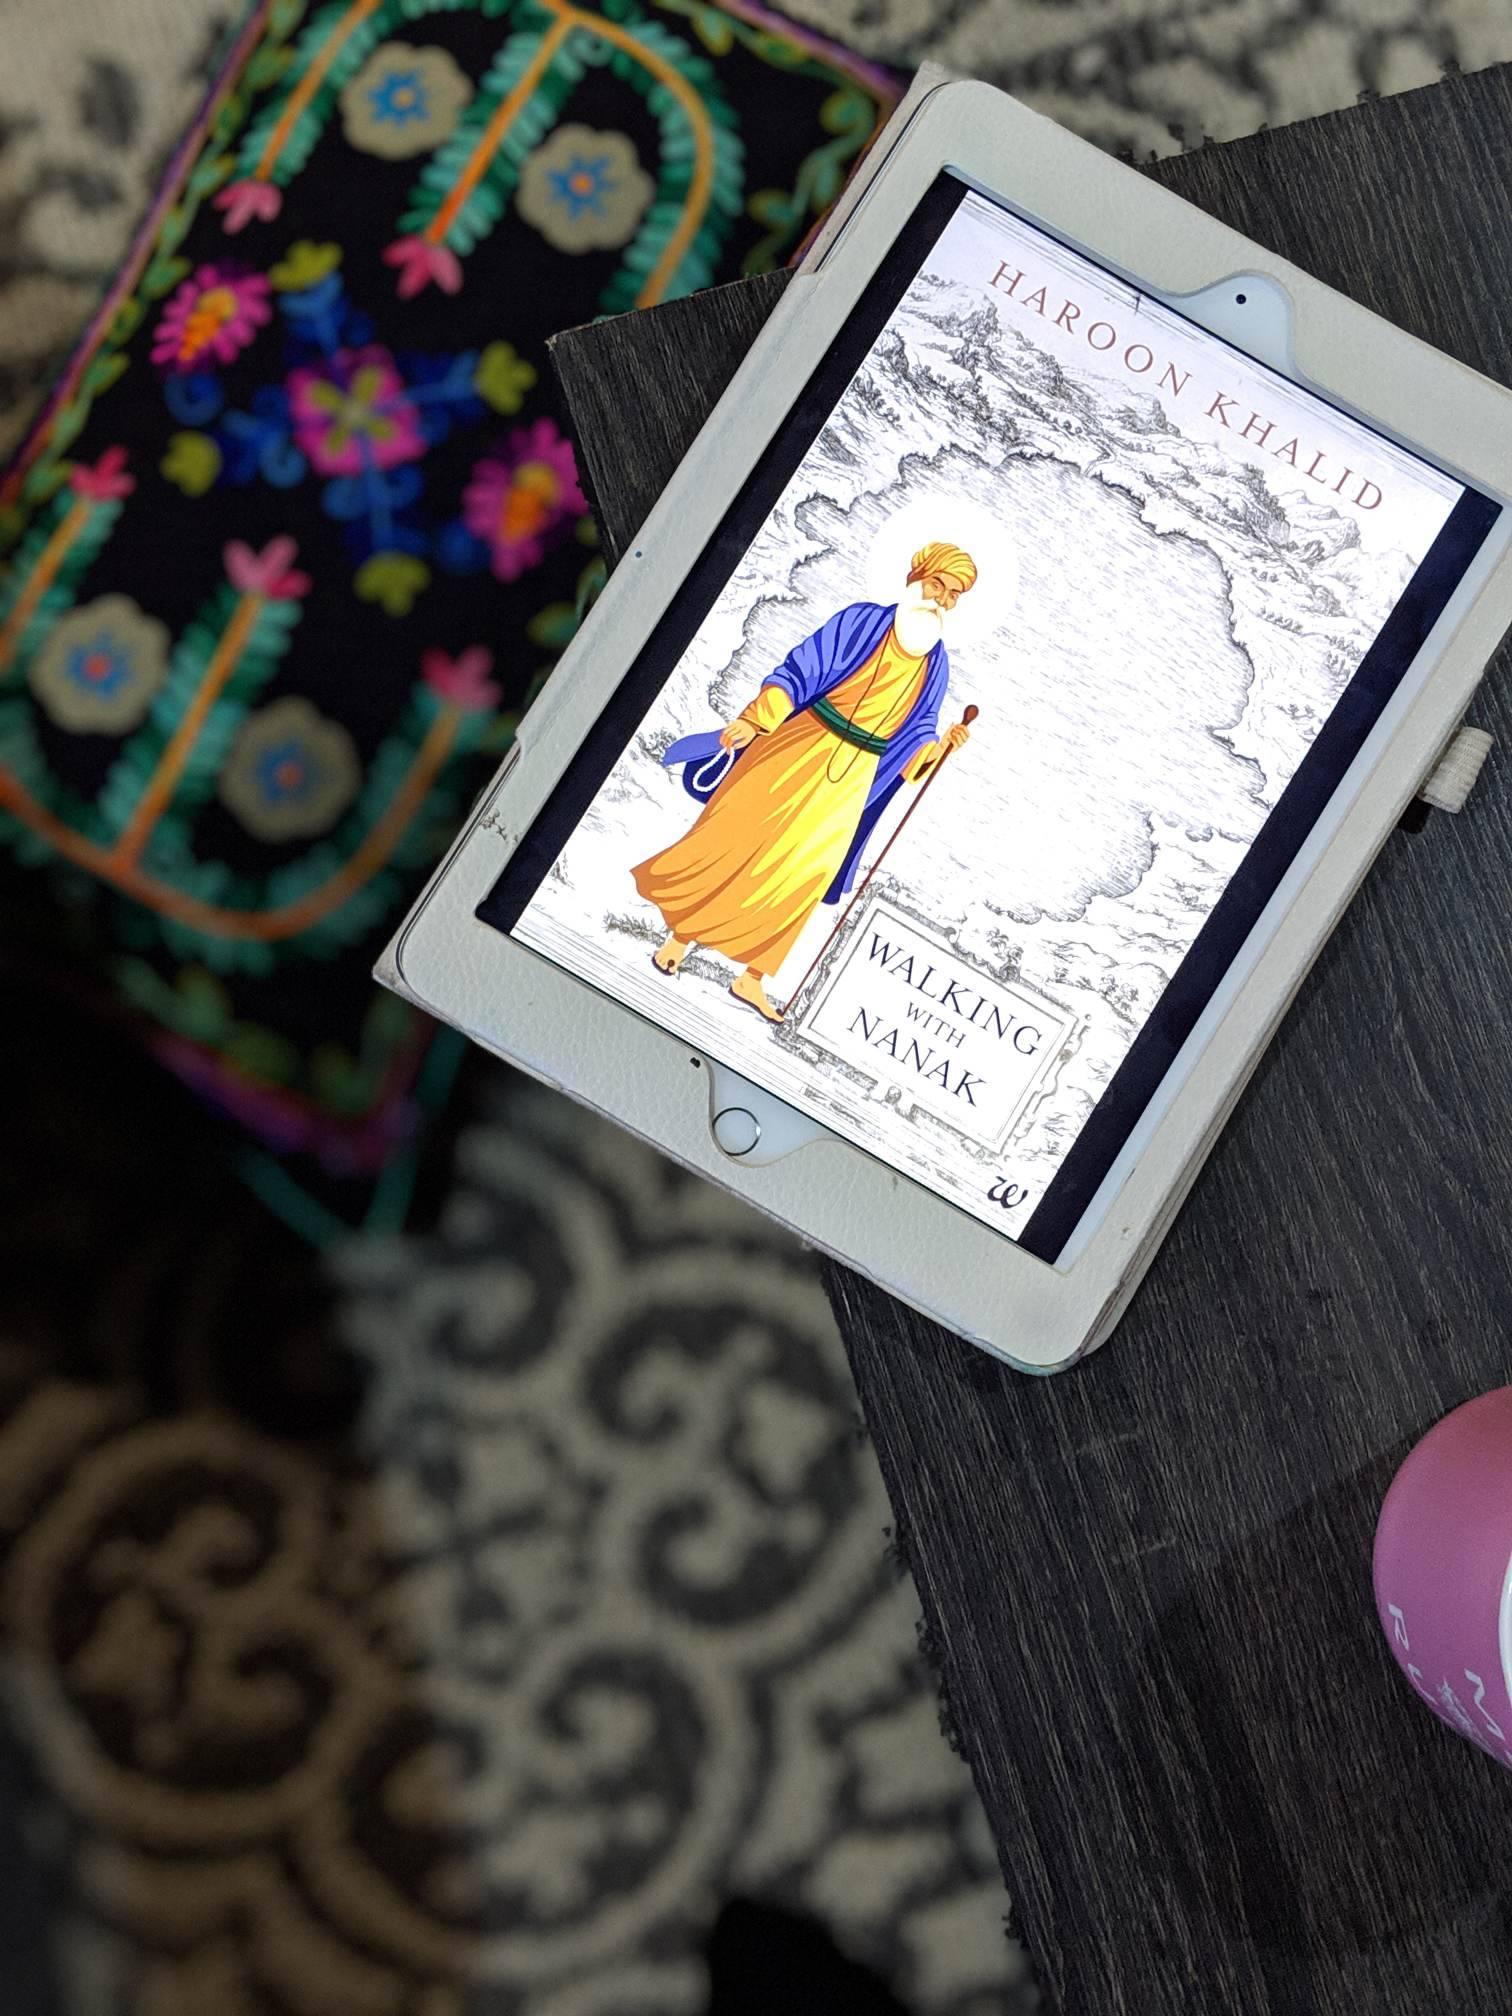 walking with nanak, walking with nanak book review, haroon khalid